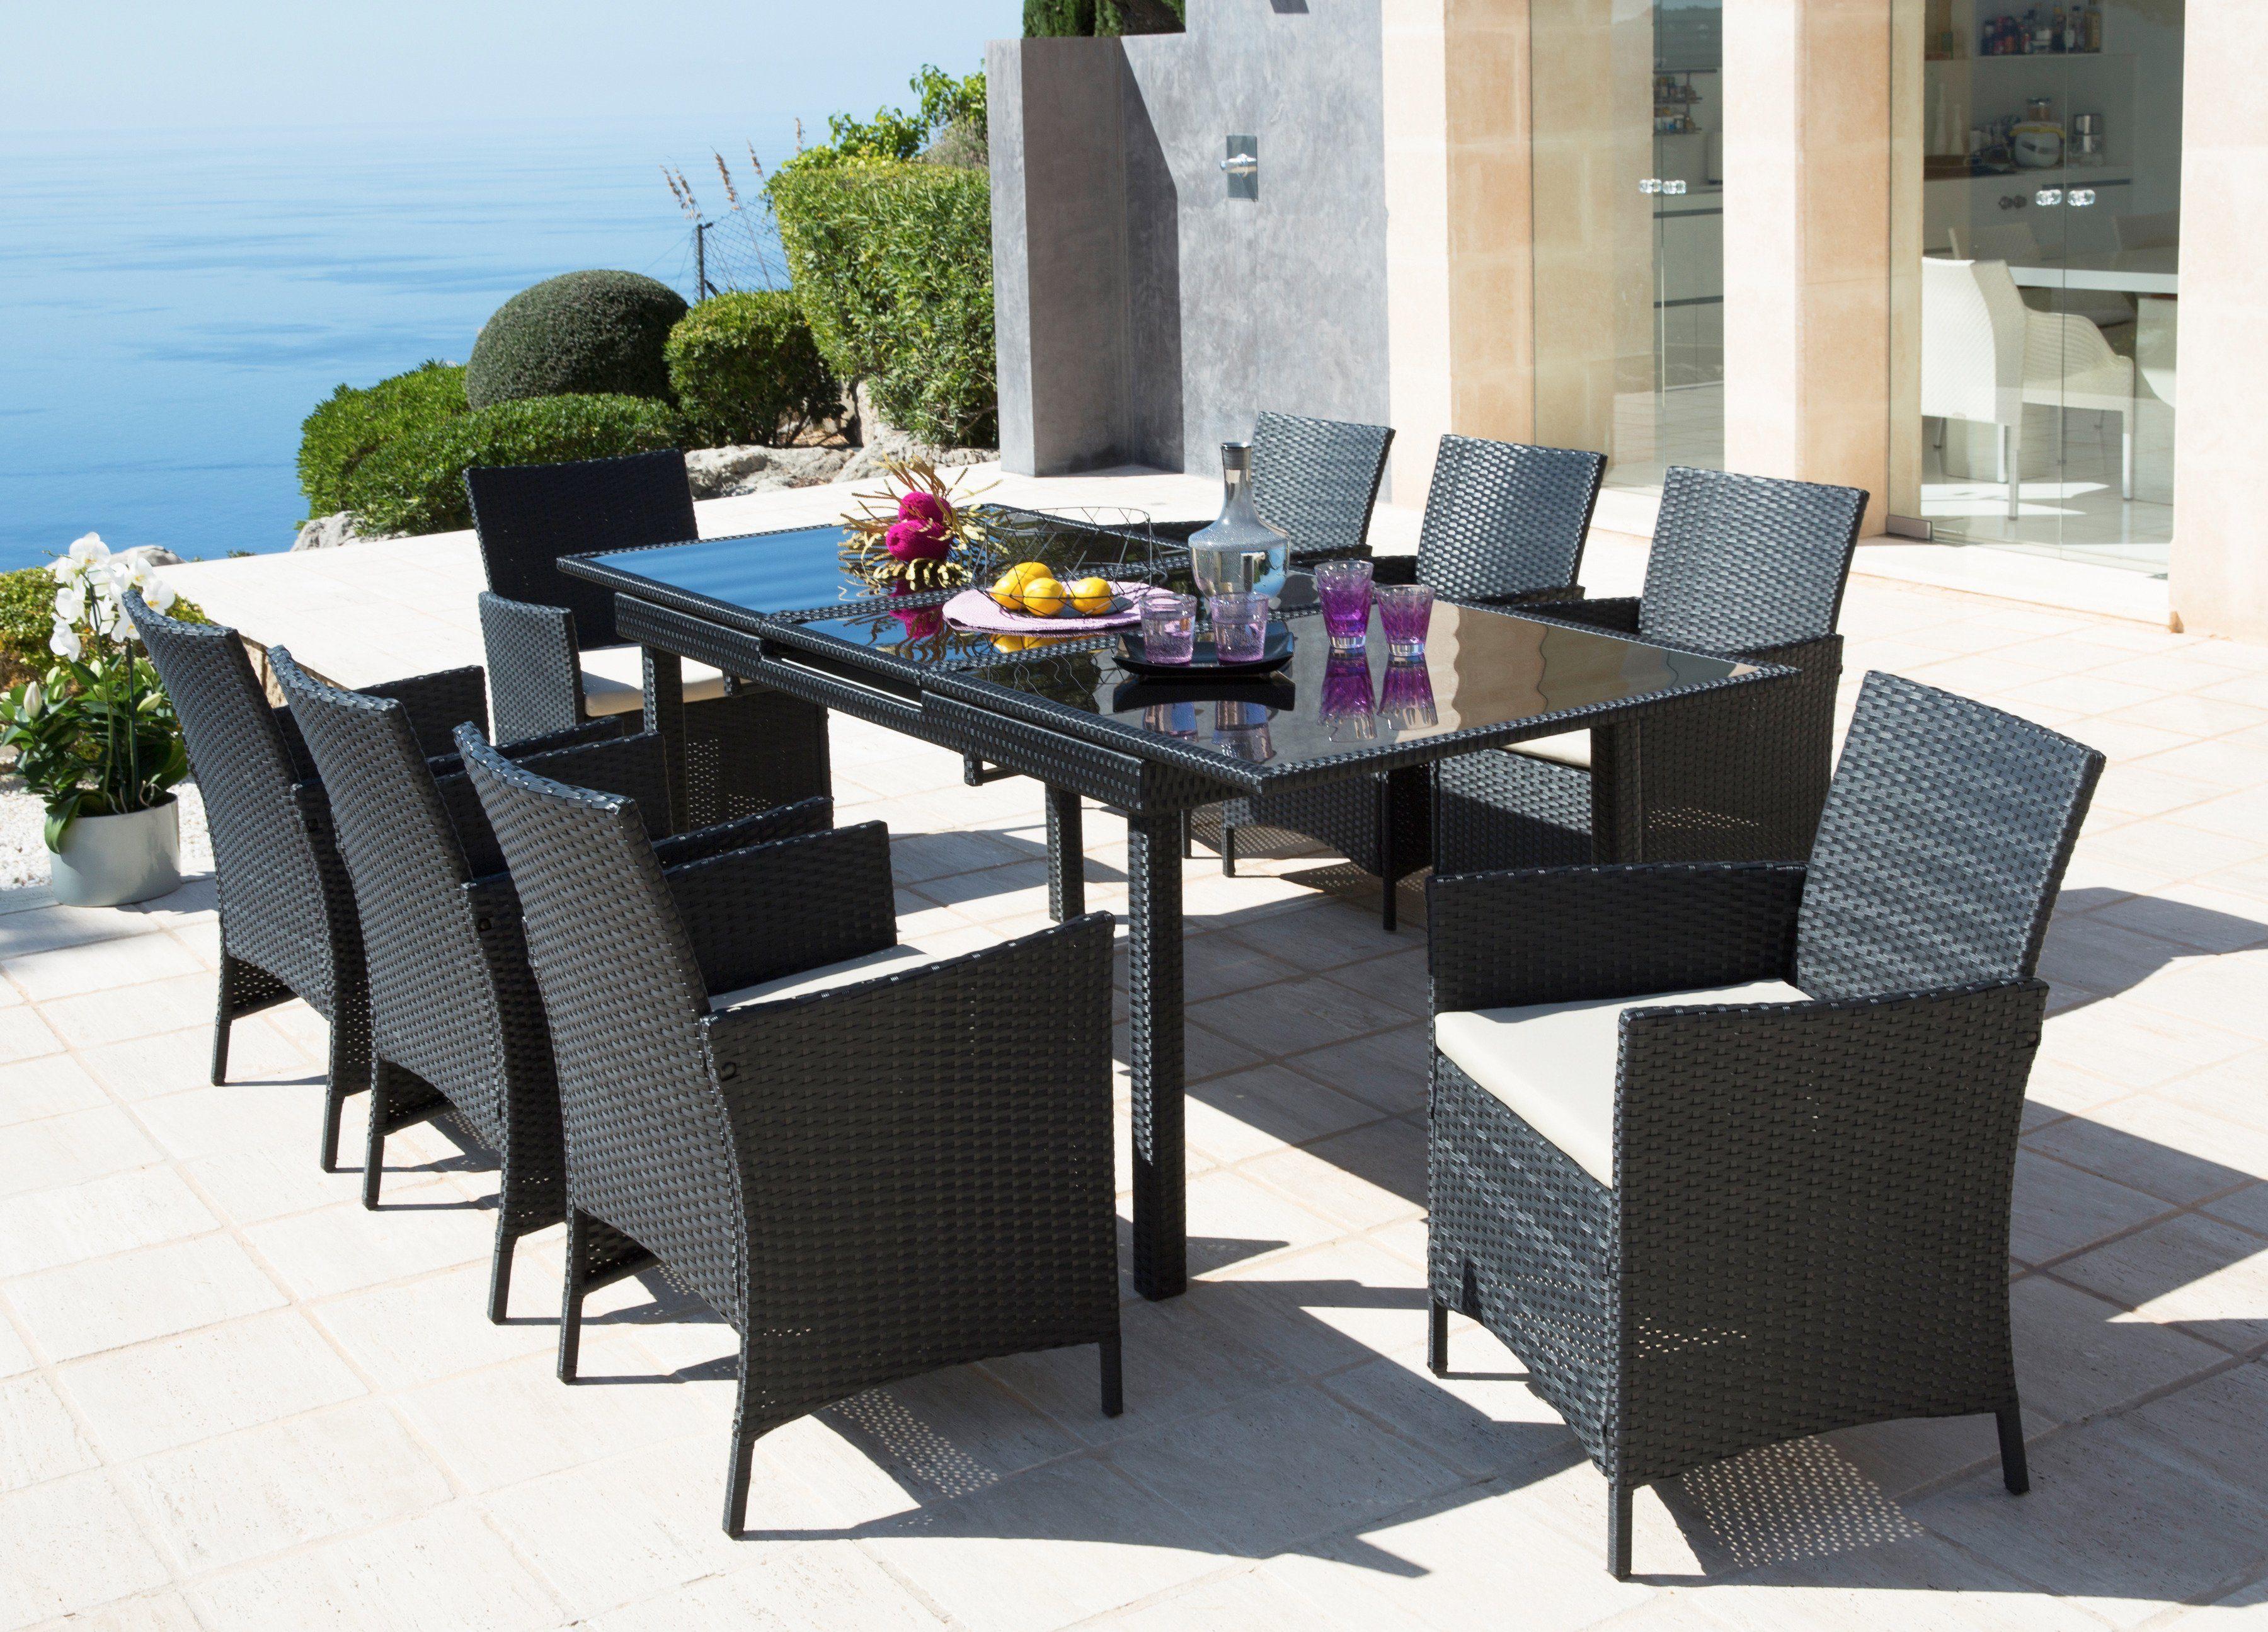 19-tgl. Gartenmöbelset »Alanya«, 8 Sessel, Tisch 160-210 cm, Polyrattan, schwarz